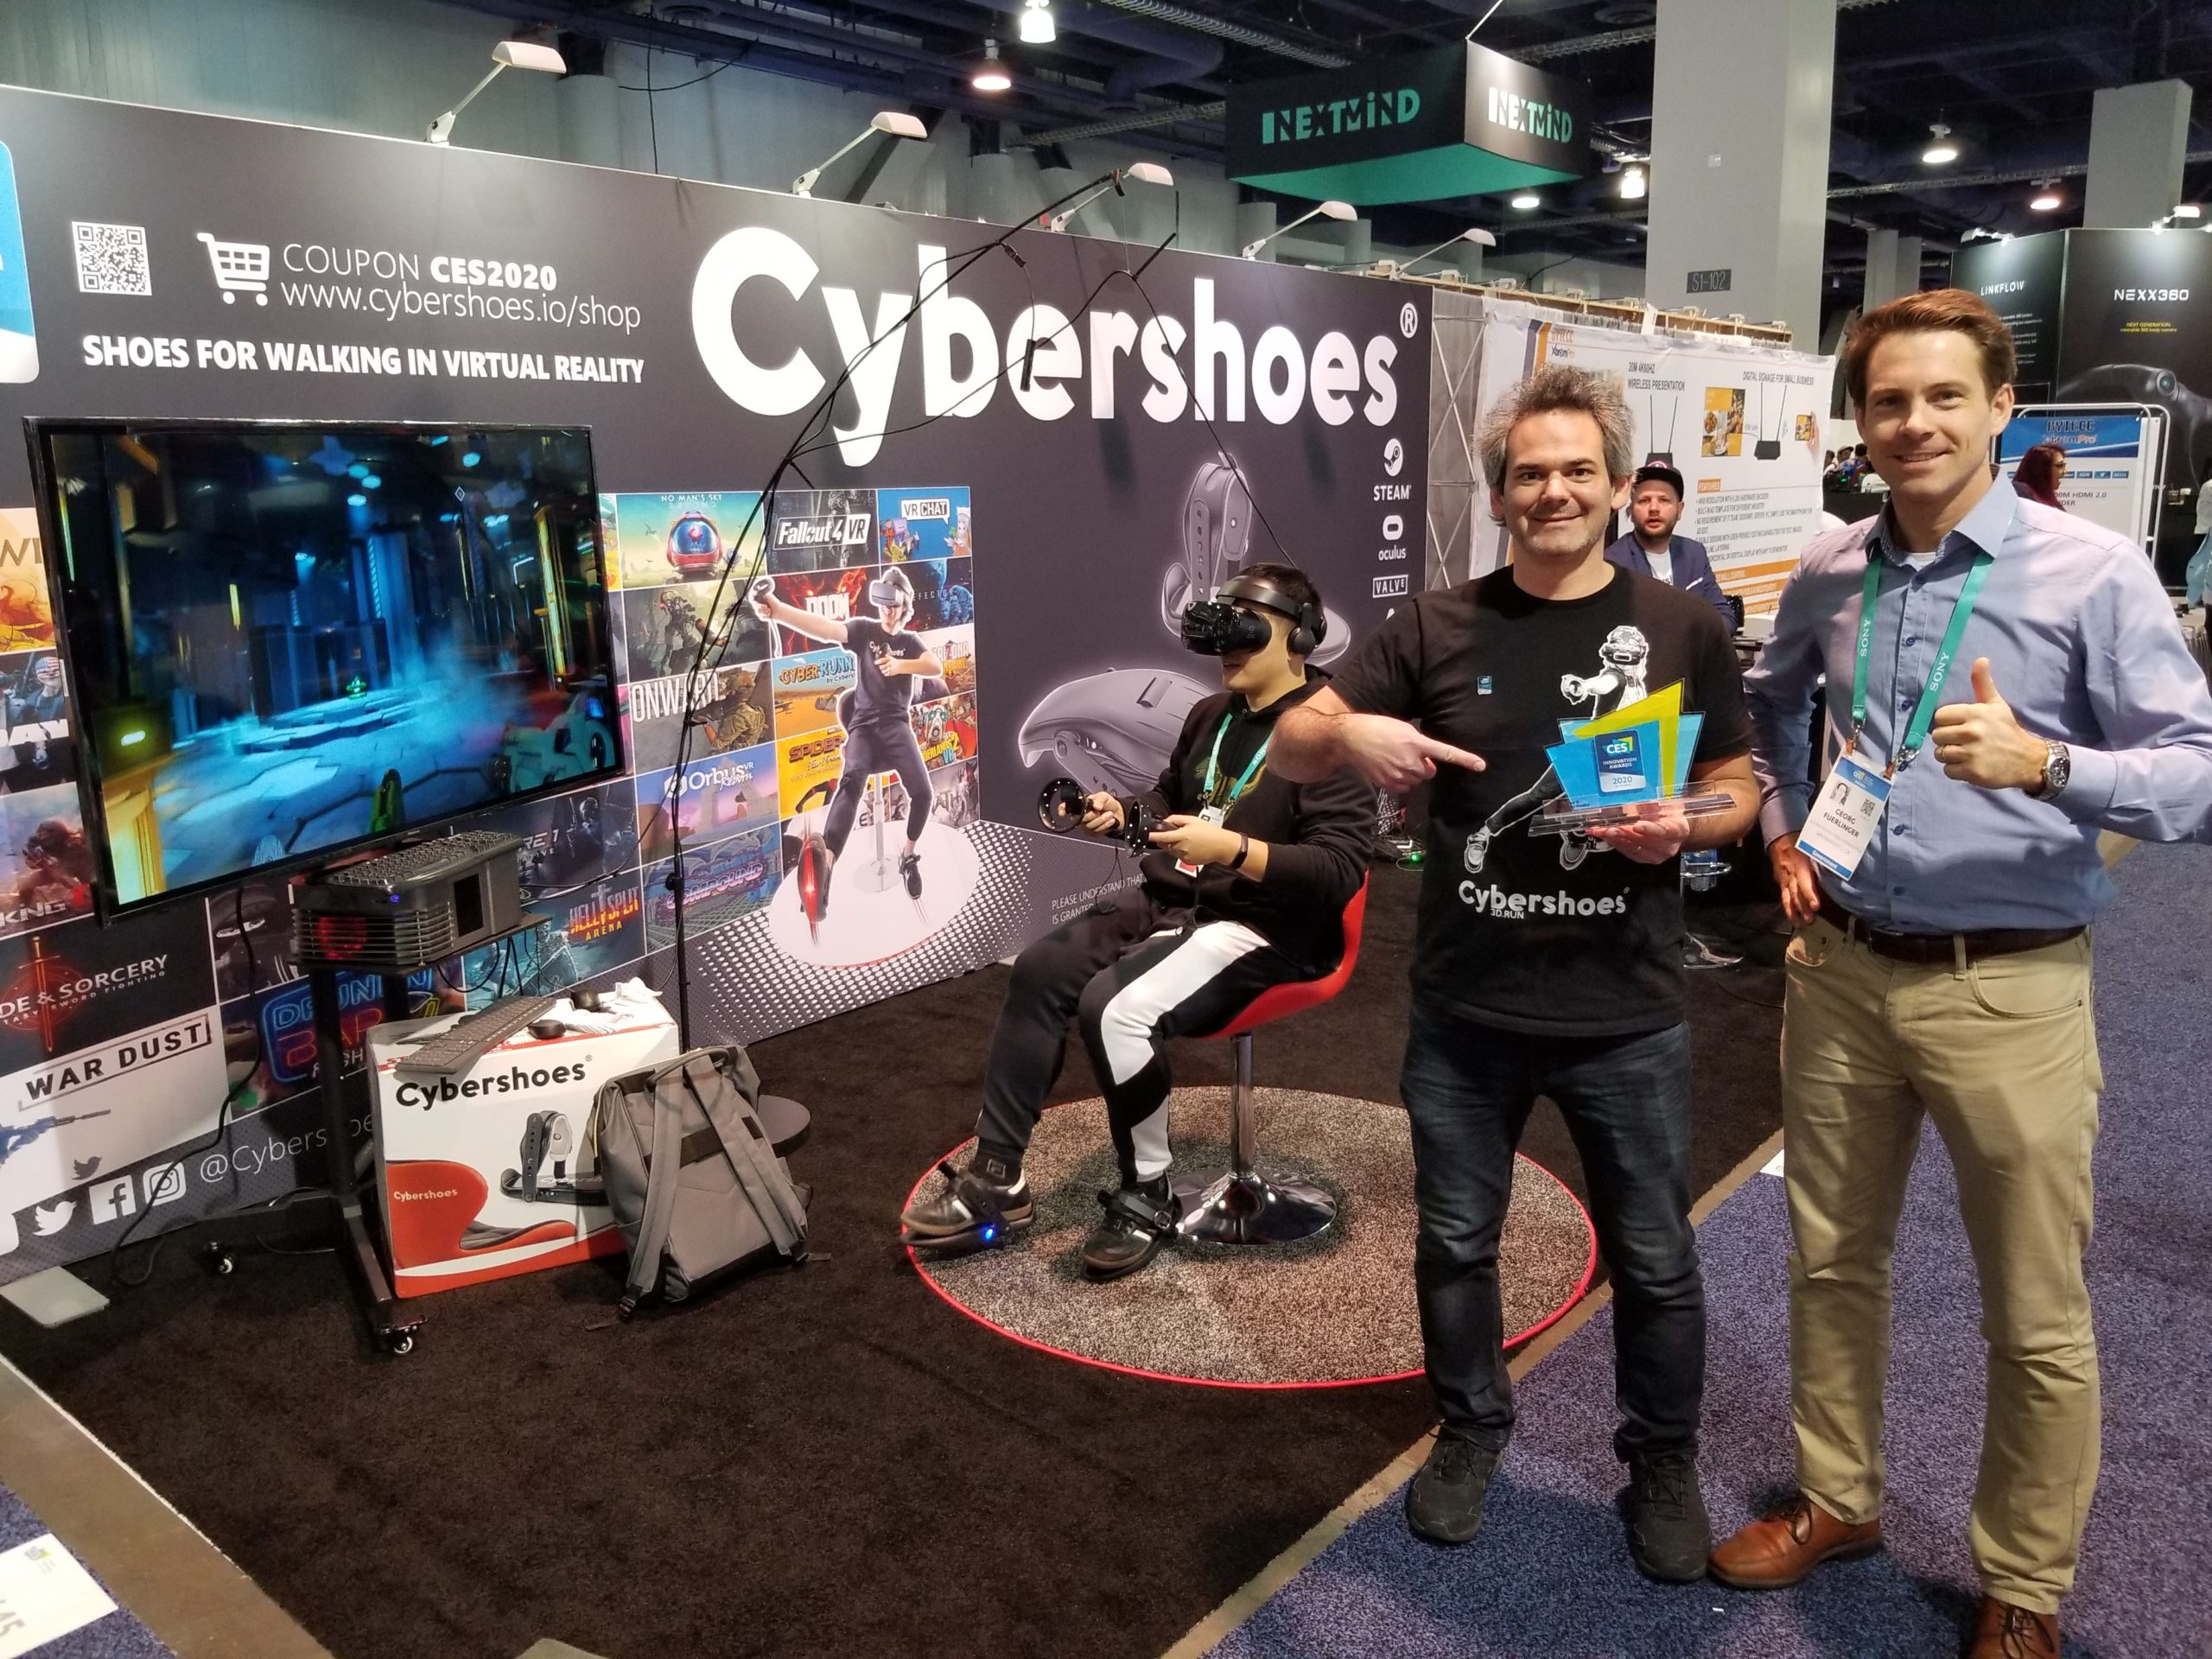 Cybershoes auf der CES 2020